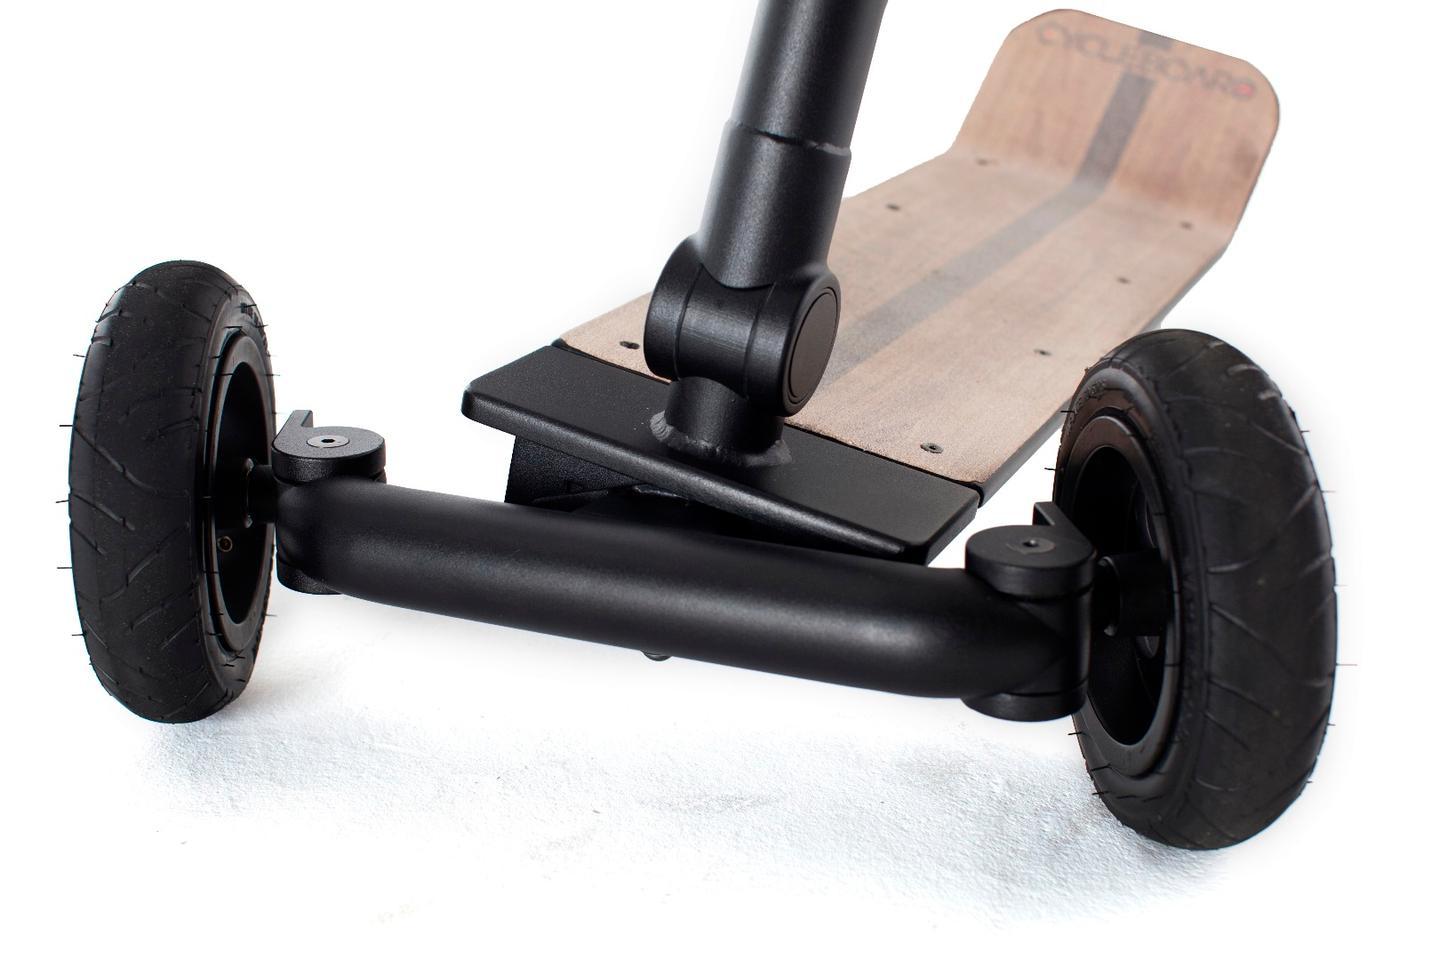 CycleBoard's lightweight, aircraft-grade aluminum frame supports a tilt-to-steer system